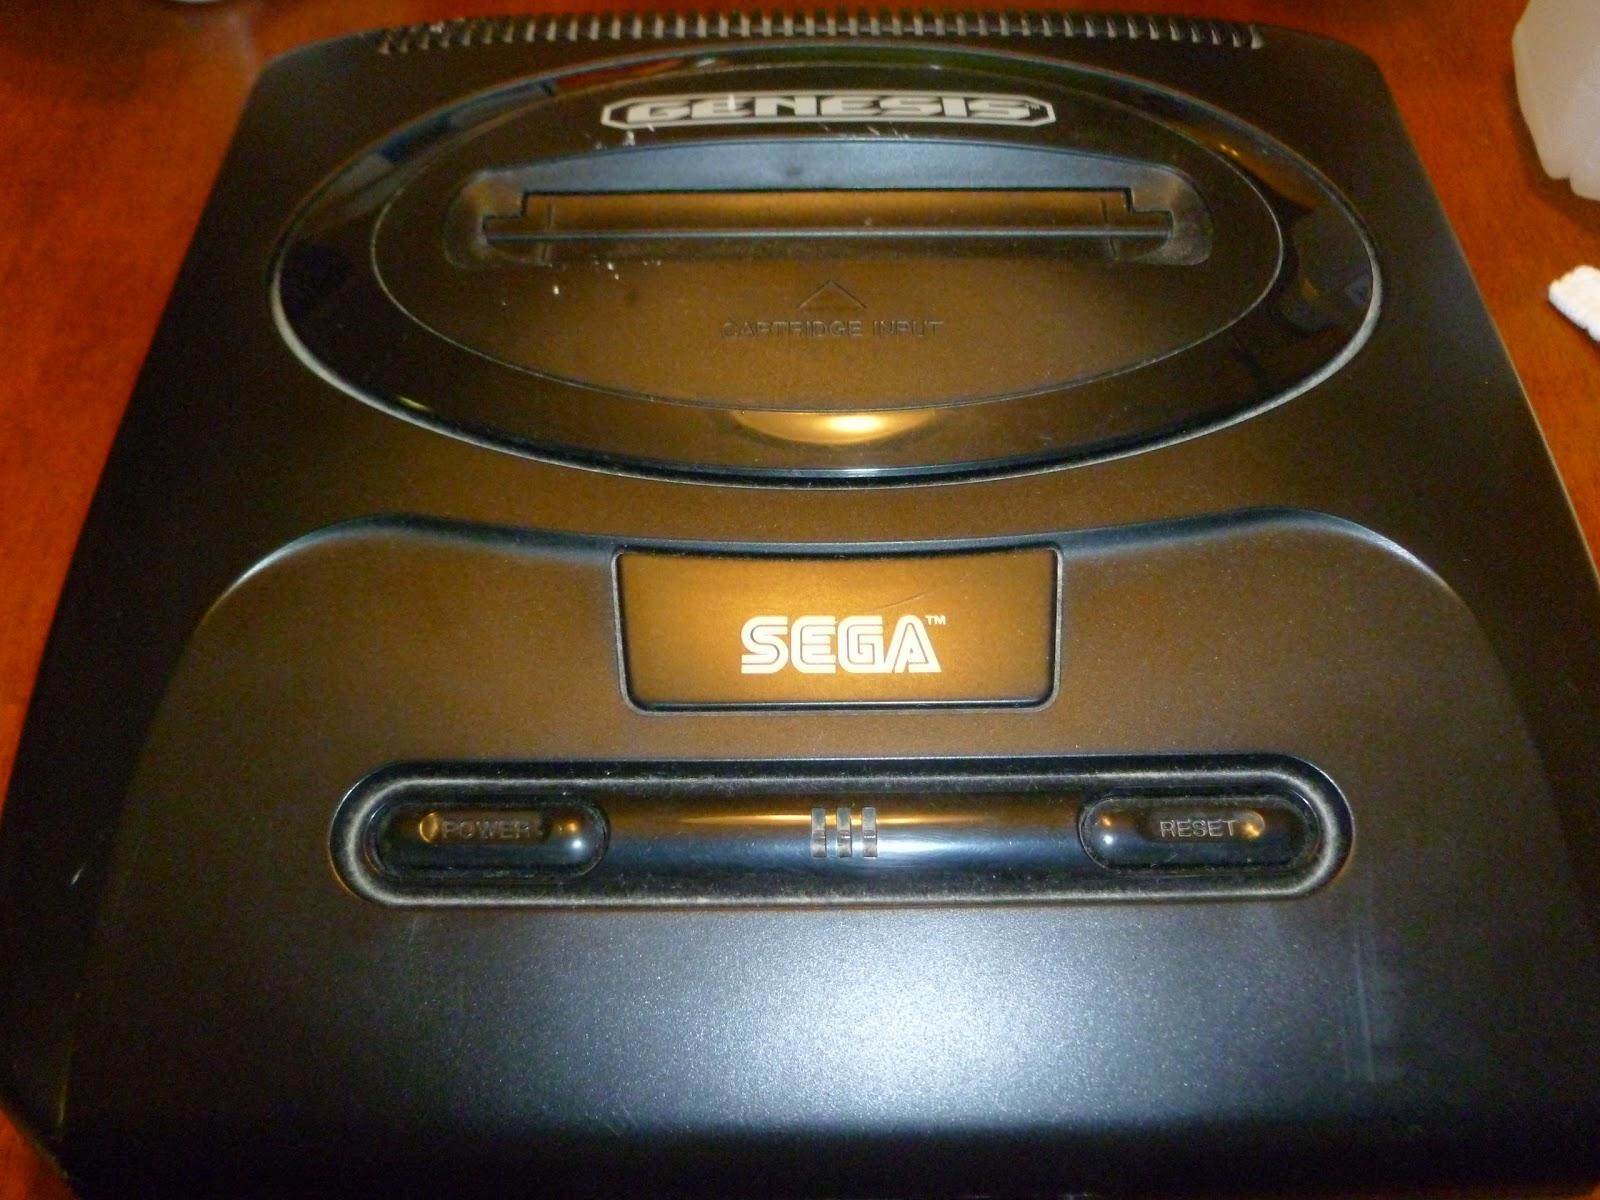 Time to blog already! Cleaning your sega genesis cartridge